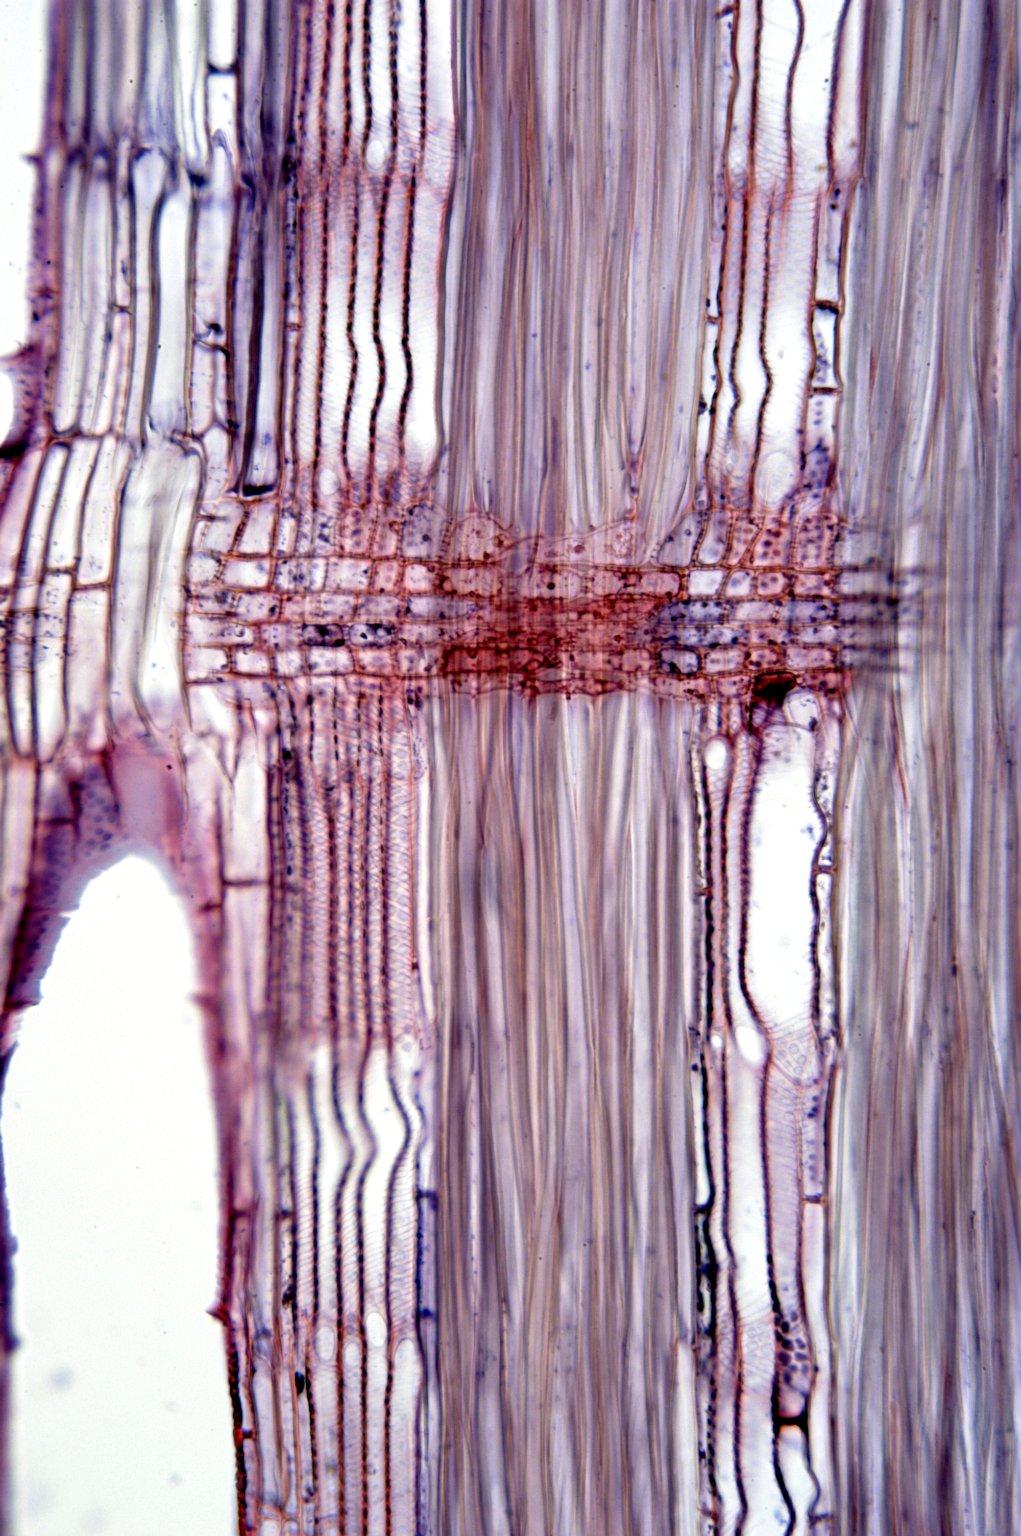 LEGUMINOSAE PAPILIONOIDEAE Maackia amurensis buergeri